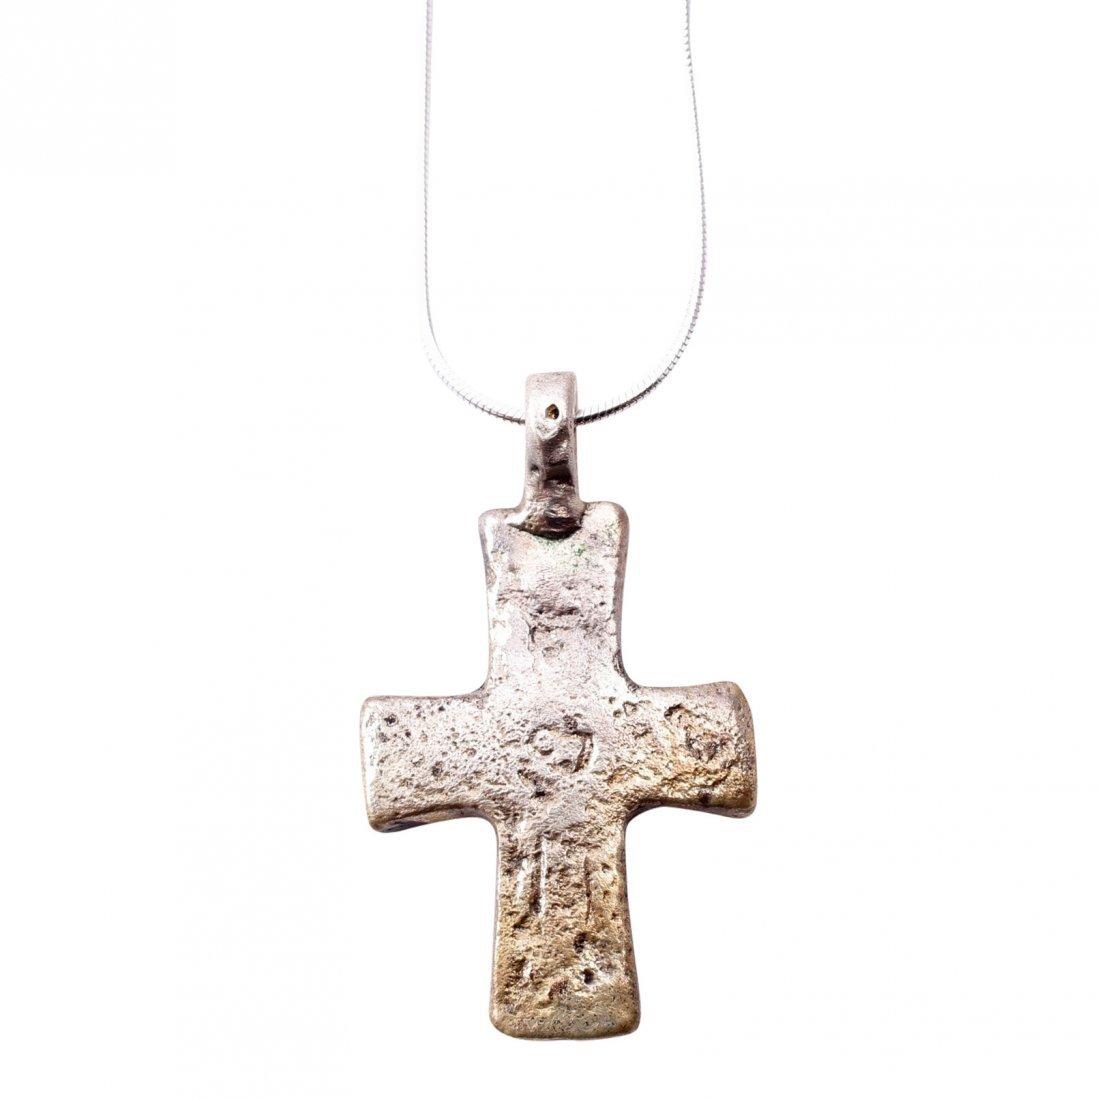 Byzantine Pilgrim's Reliquary Cross 9-12th C